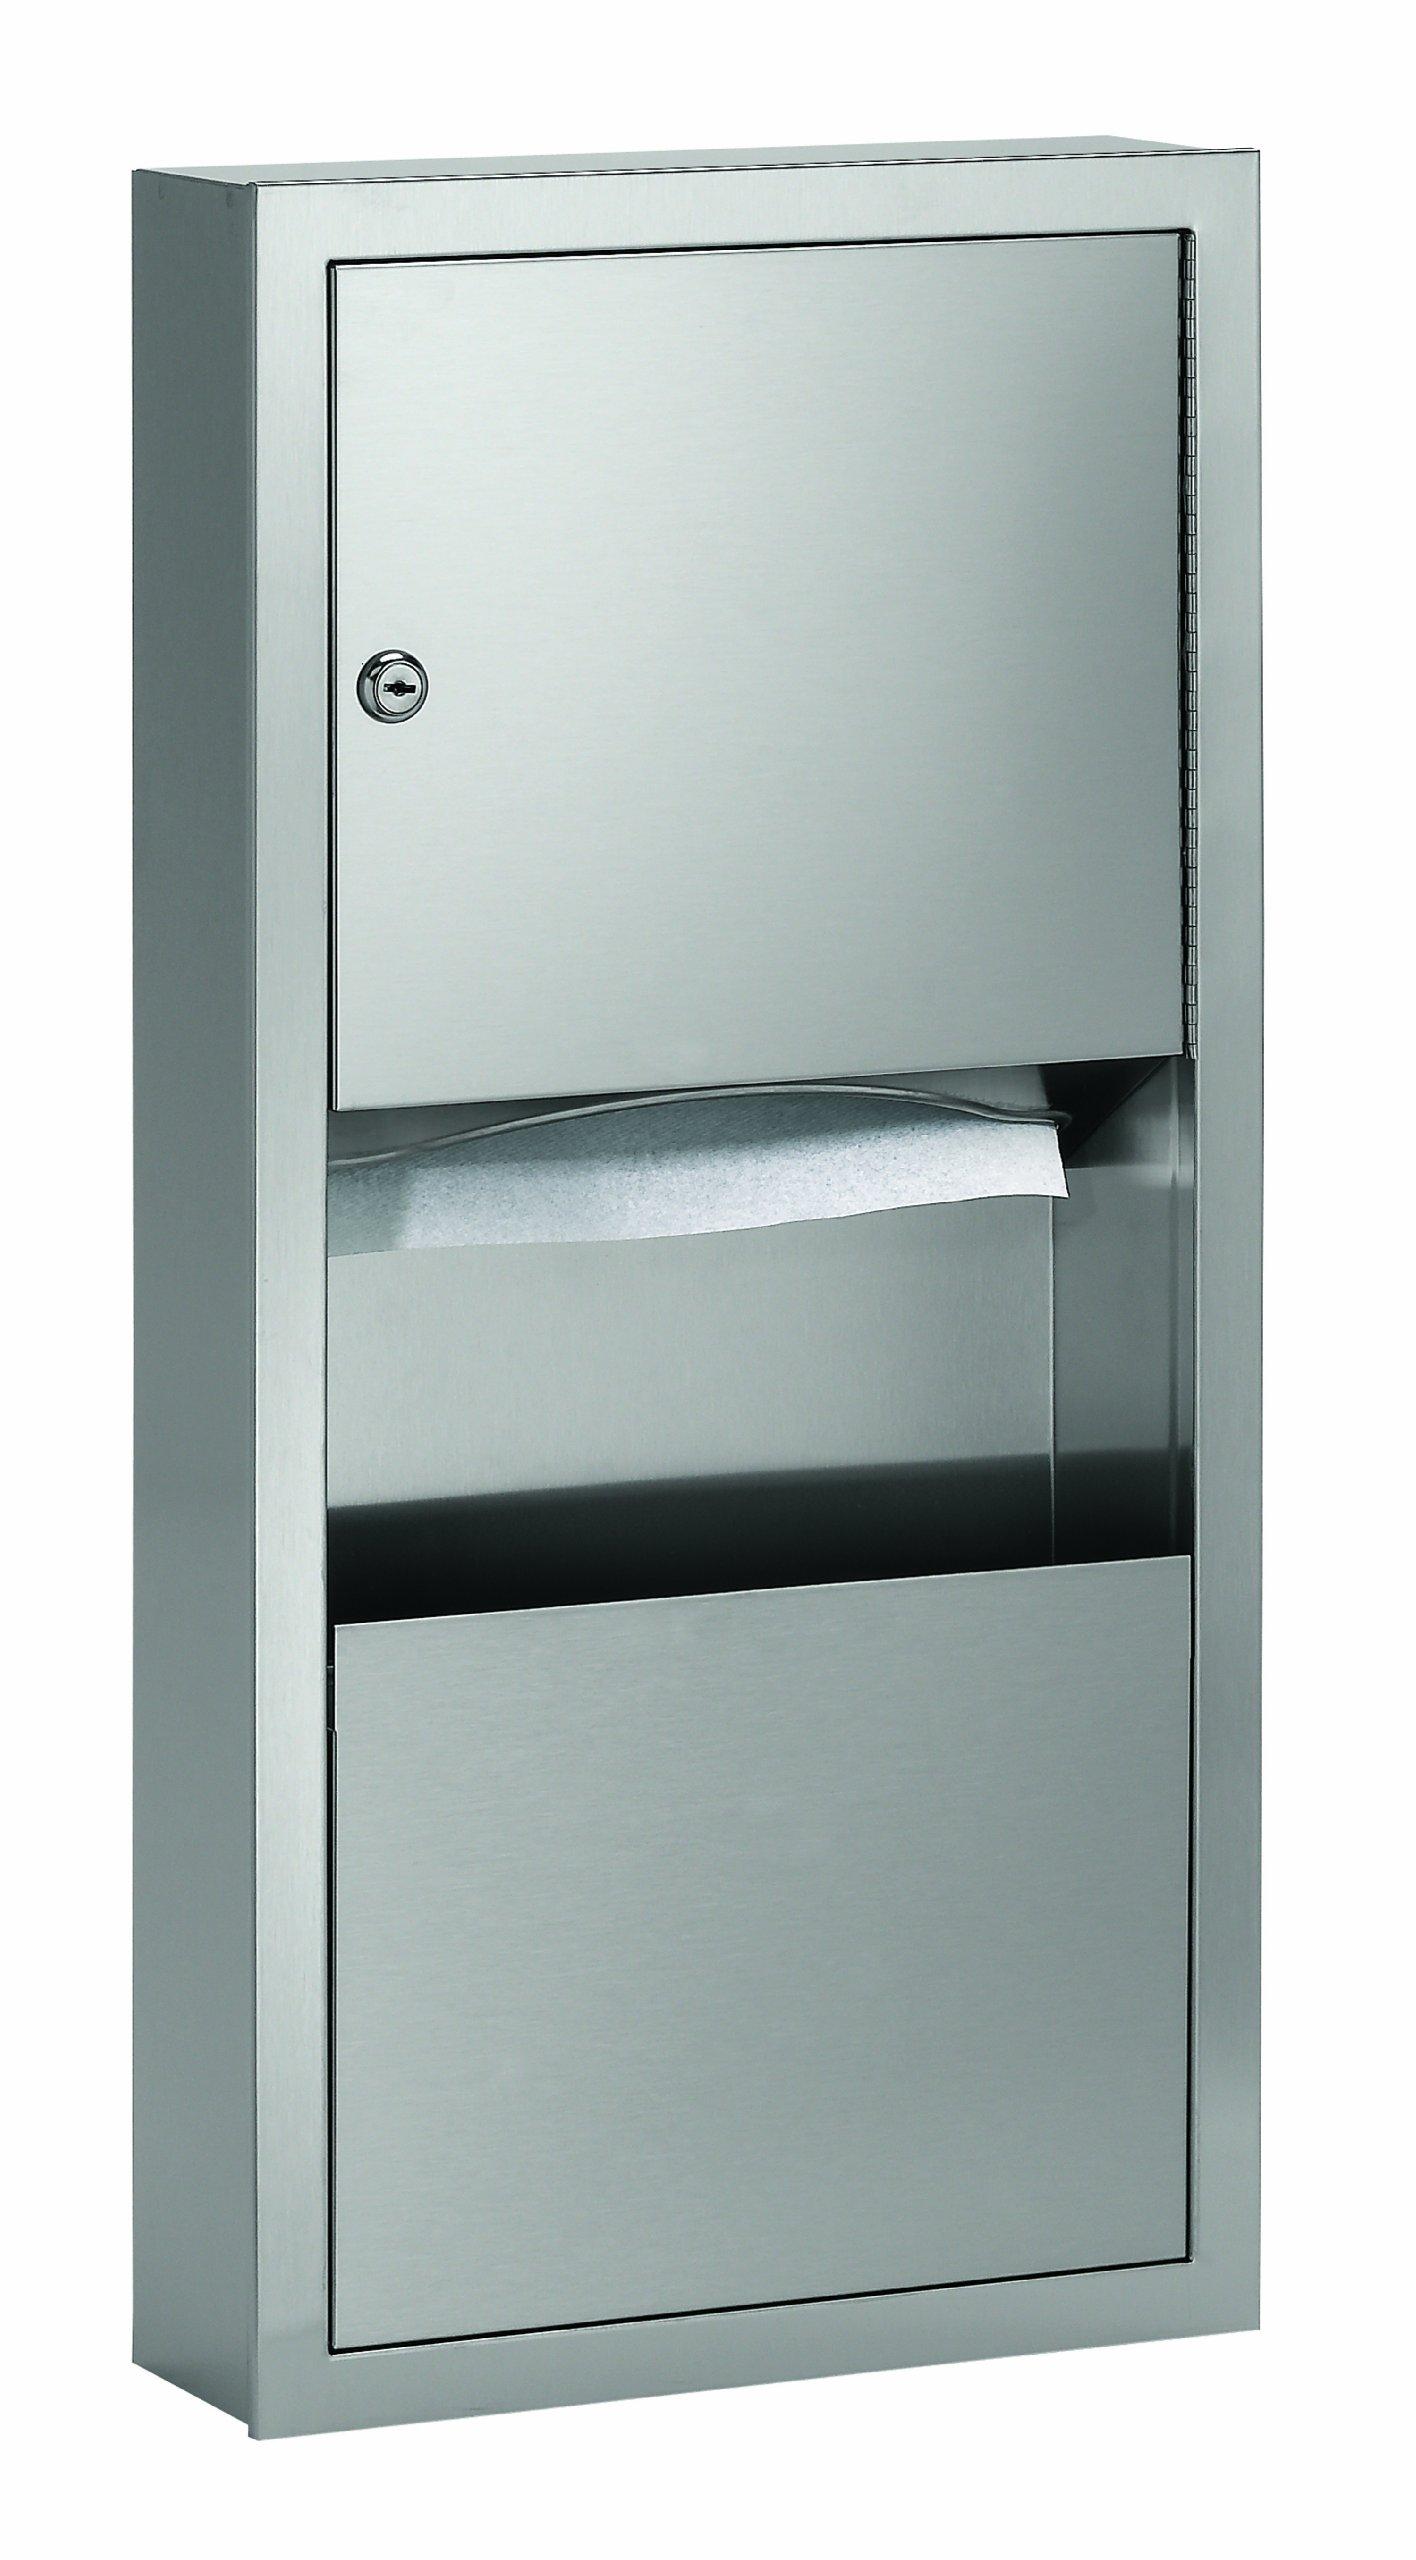 Bradley 2291-110000 Standard Stainless Steel Surface Mounted Towel Dispenser/Waste Receptacle, 14'' Width x 28'' Height x 4'' Depth